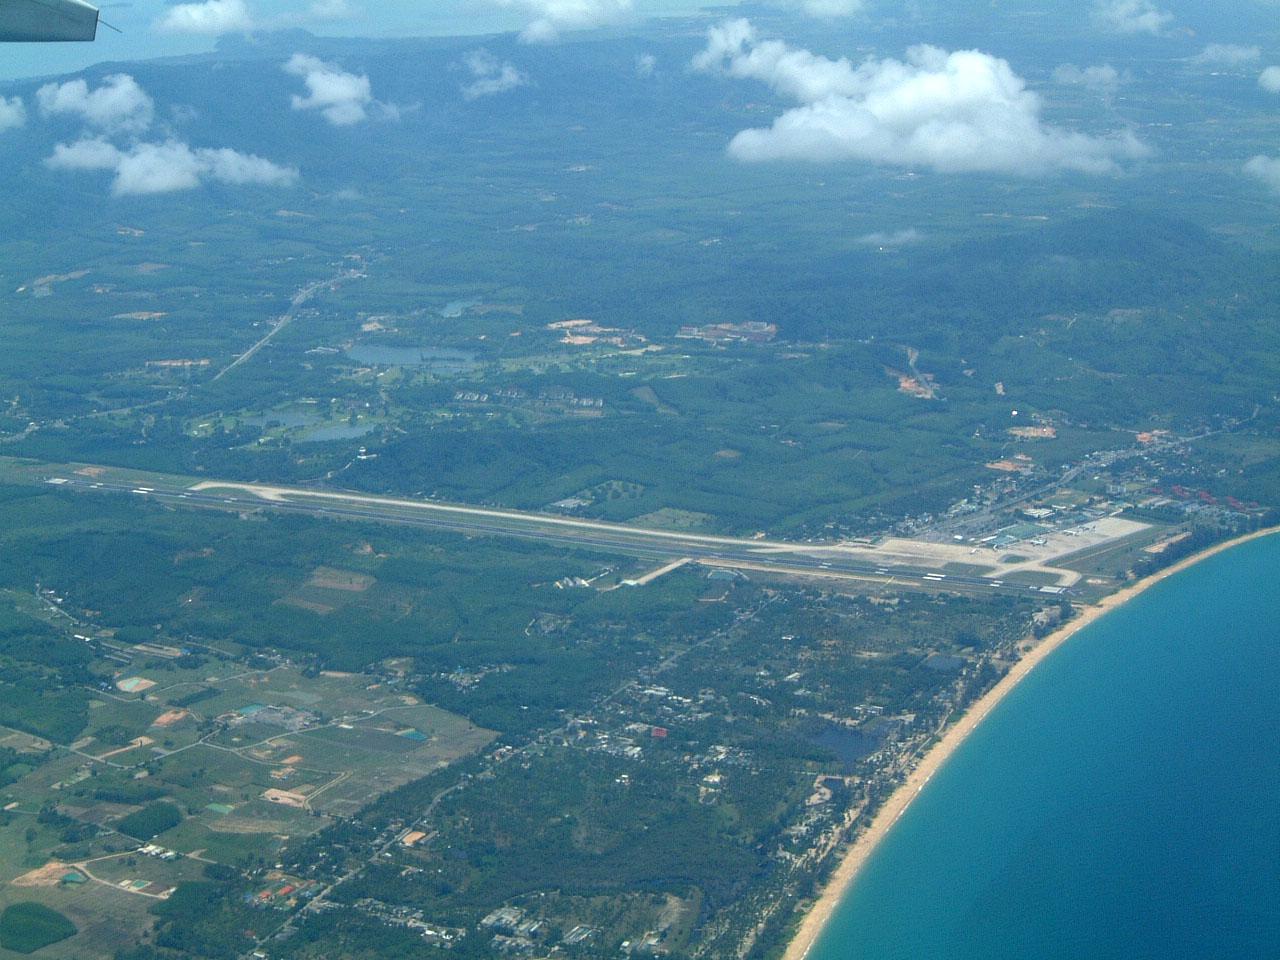 Thailand Aerial view of Phuket International Airport Apr 2003 02